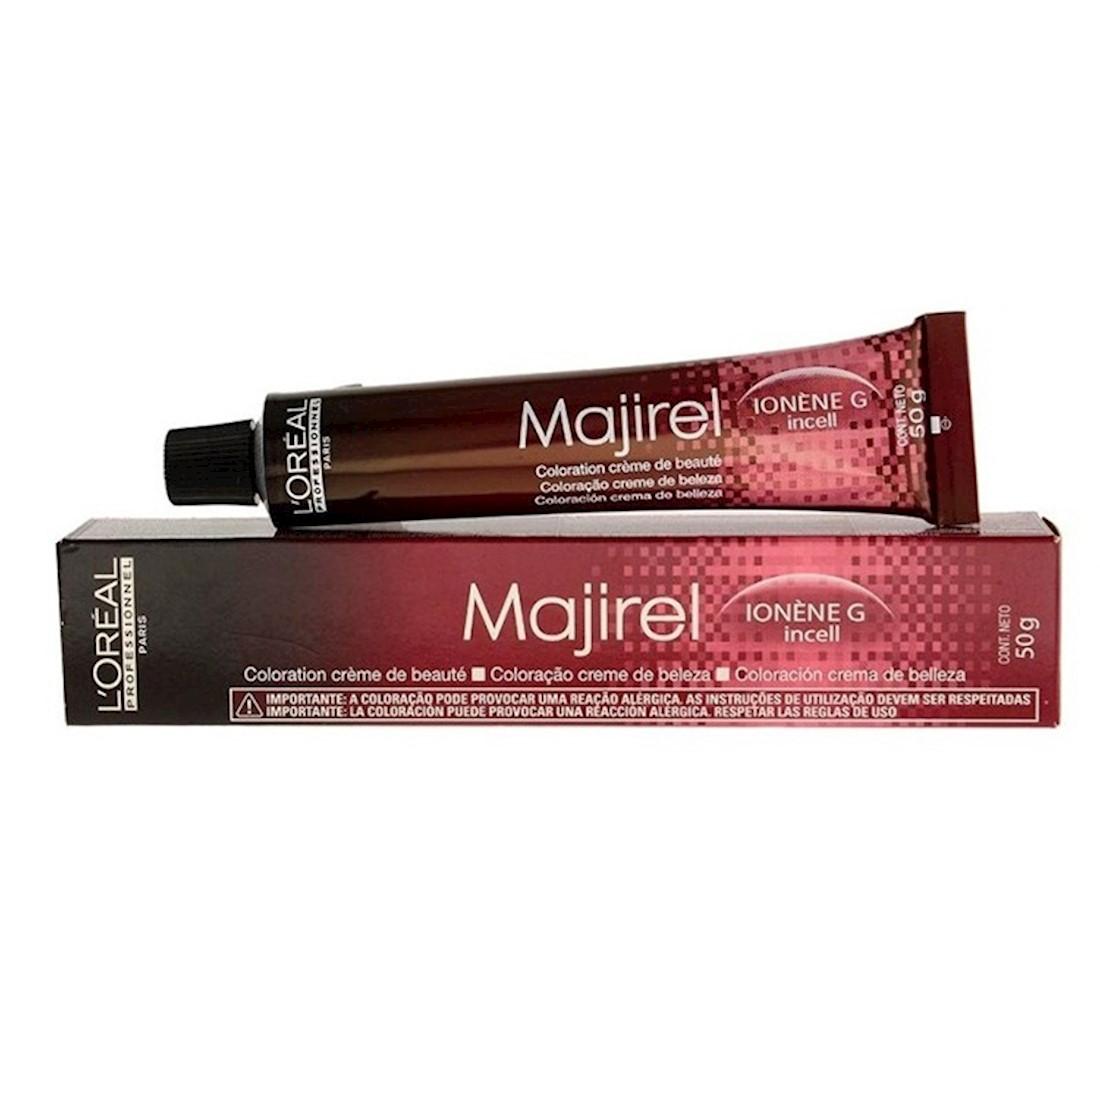 Coloração Majirel 6,07 (Louro escuro natural frio) da L'Oreal 50g